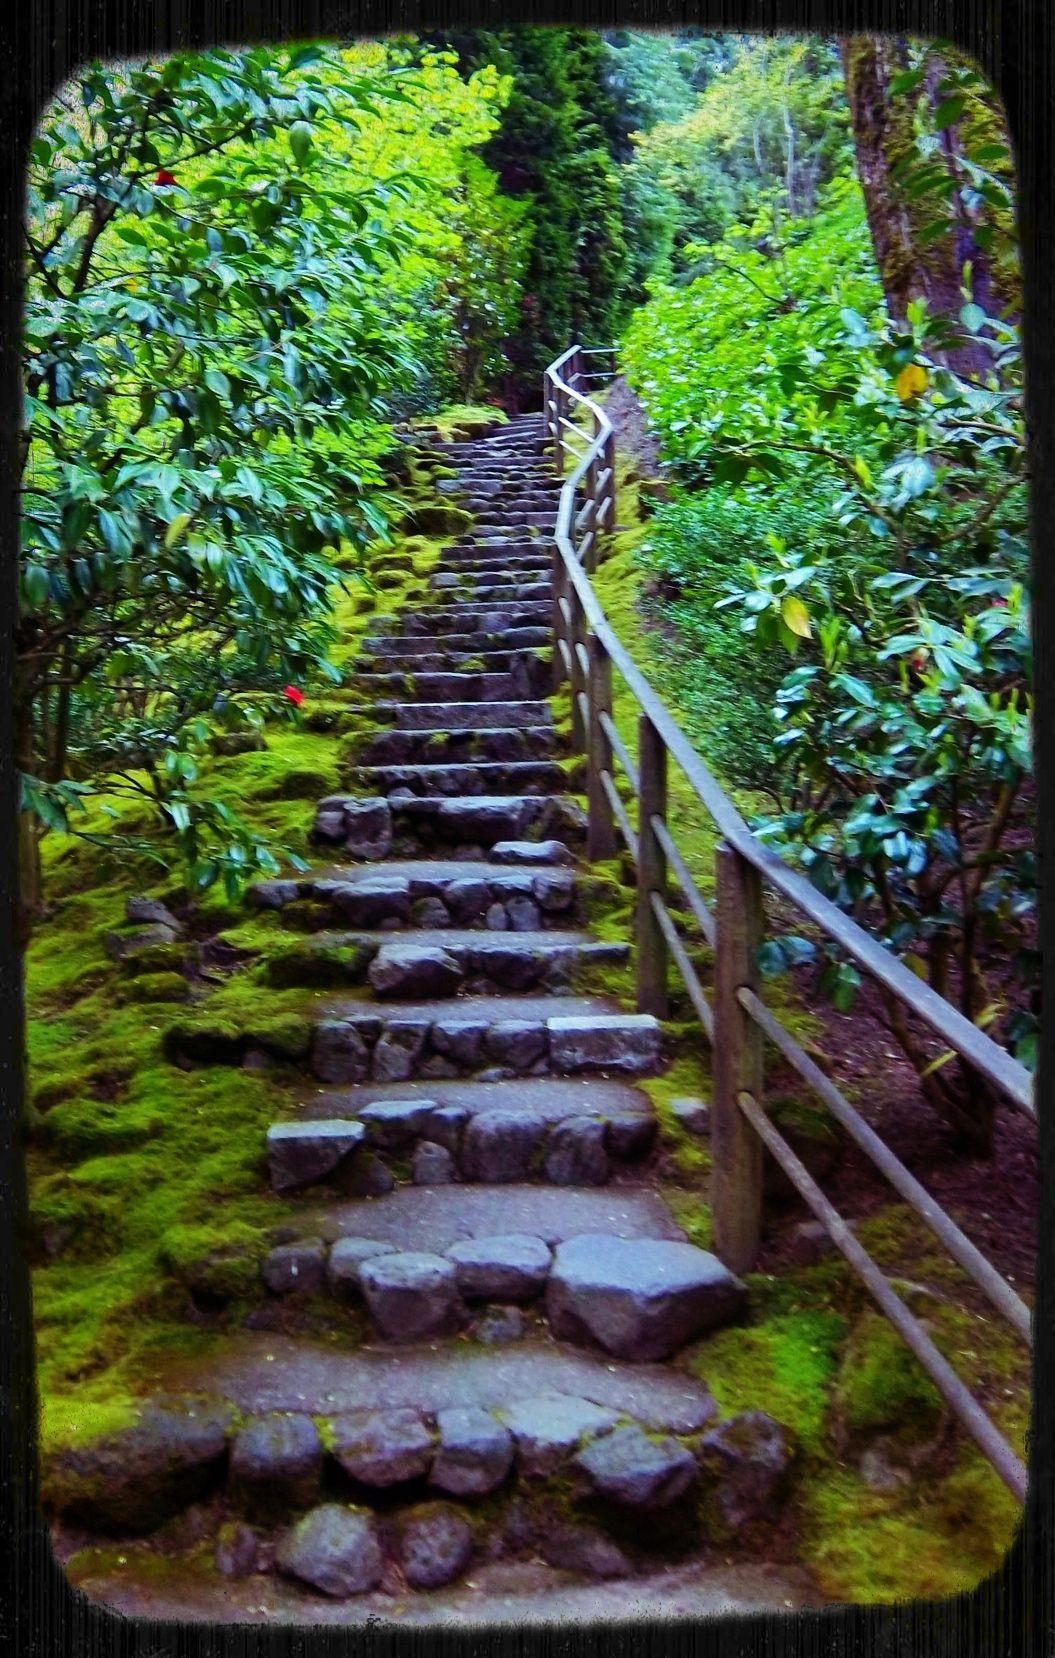 Portland Japanese Garden. if i find myself in portland, i